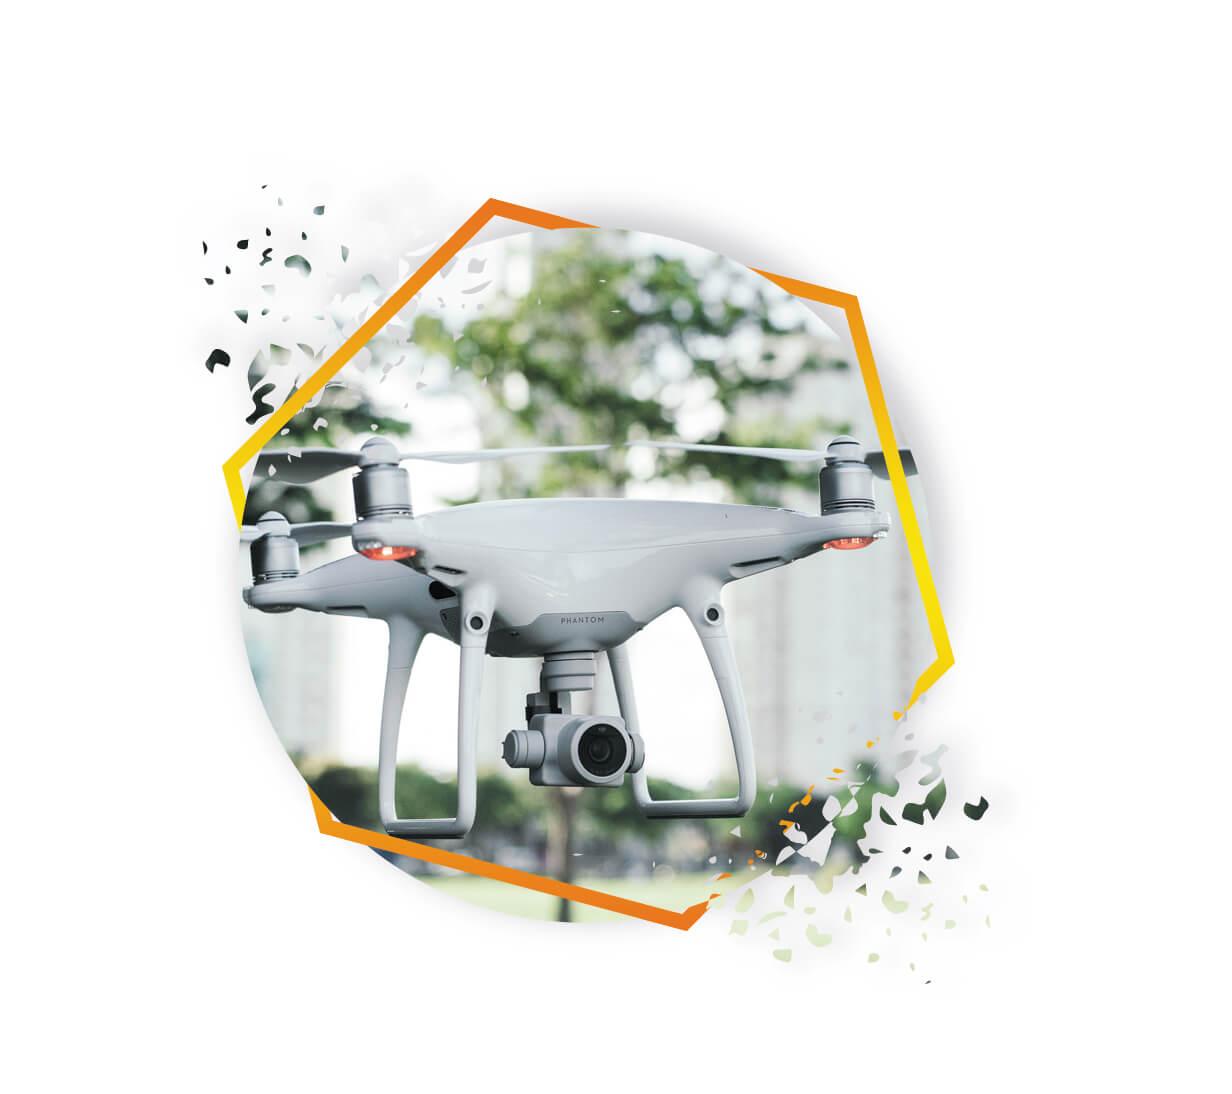 flycam-dang-ky-su-kien-khoa-hoc-cong-nghe-2019